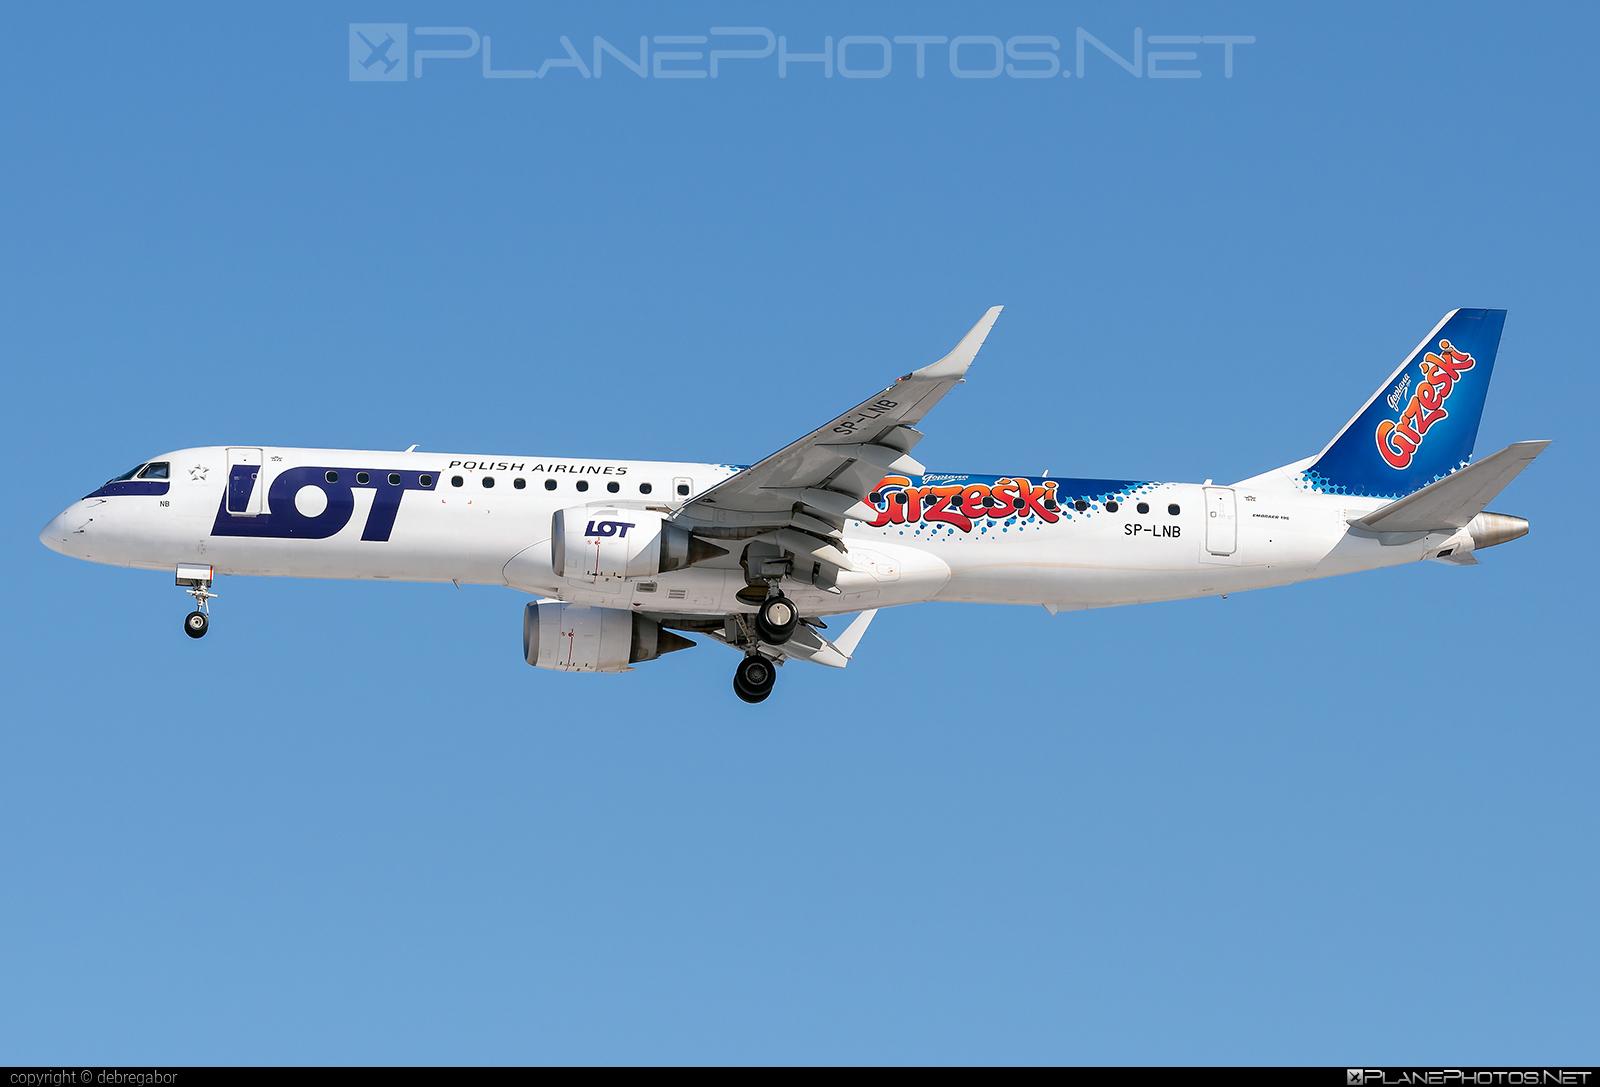 Embraer E195LR (ERJ-190-200LR) - SP-LNB operated by LOT Polish Airlines #e190 #e190200 #e190200lr #e195lr #embraer #embraer190200lr #embraer195 #embraer195lr #lot #lotpolishairlines